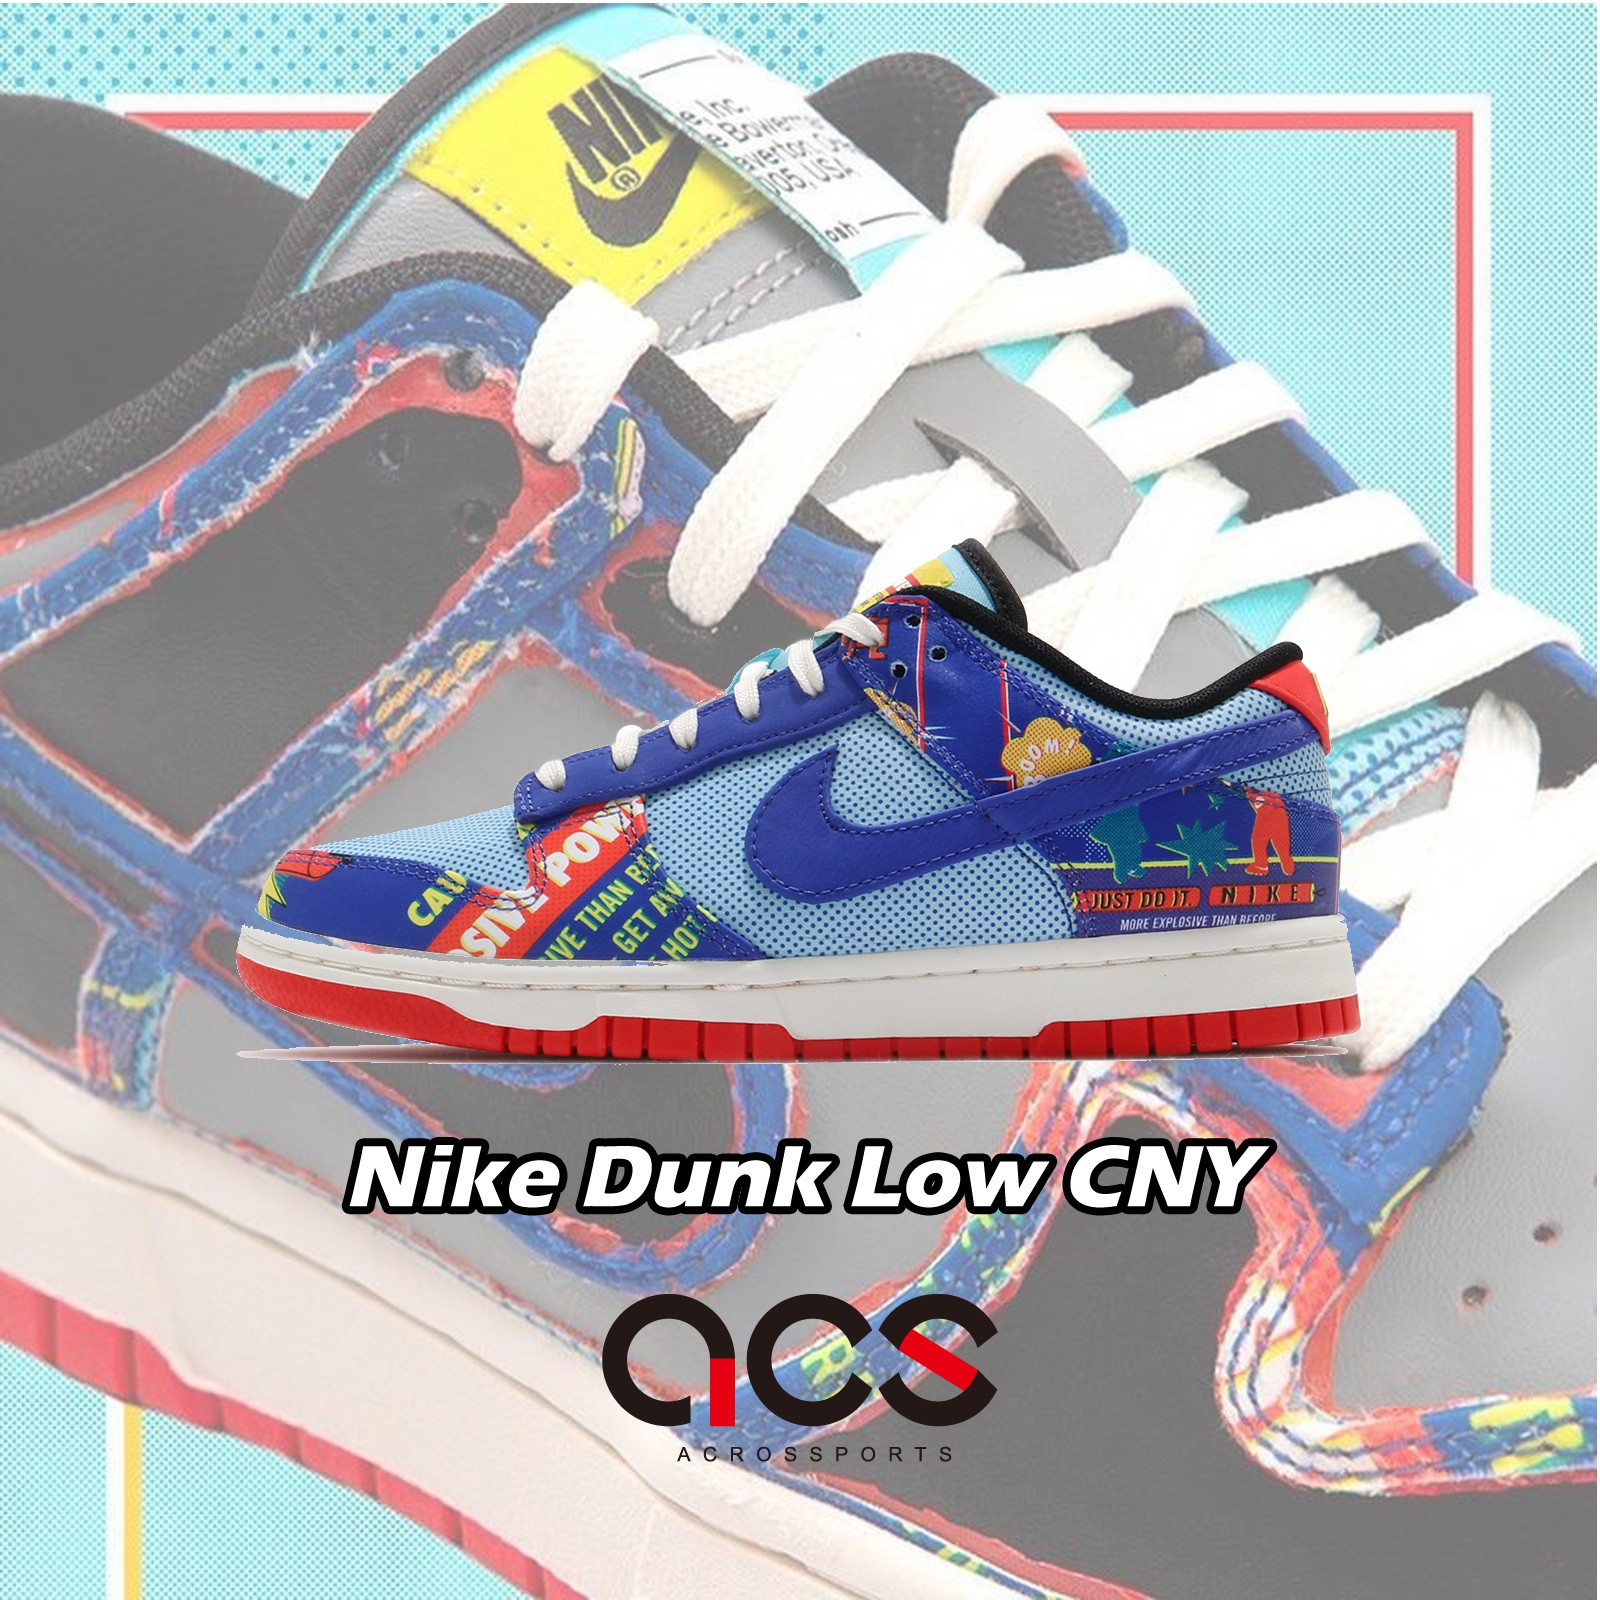 Nike Wmns Dunk Low 藍 紅 CNY 中國新年 鞭炮 女鞋 撕撕樂 【ACS】 DH4966-446